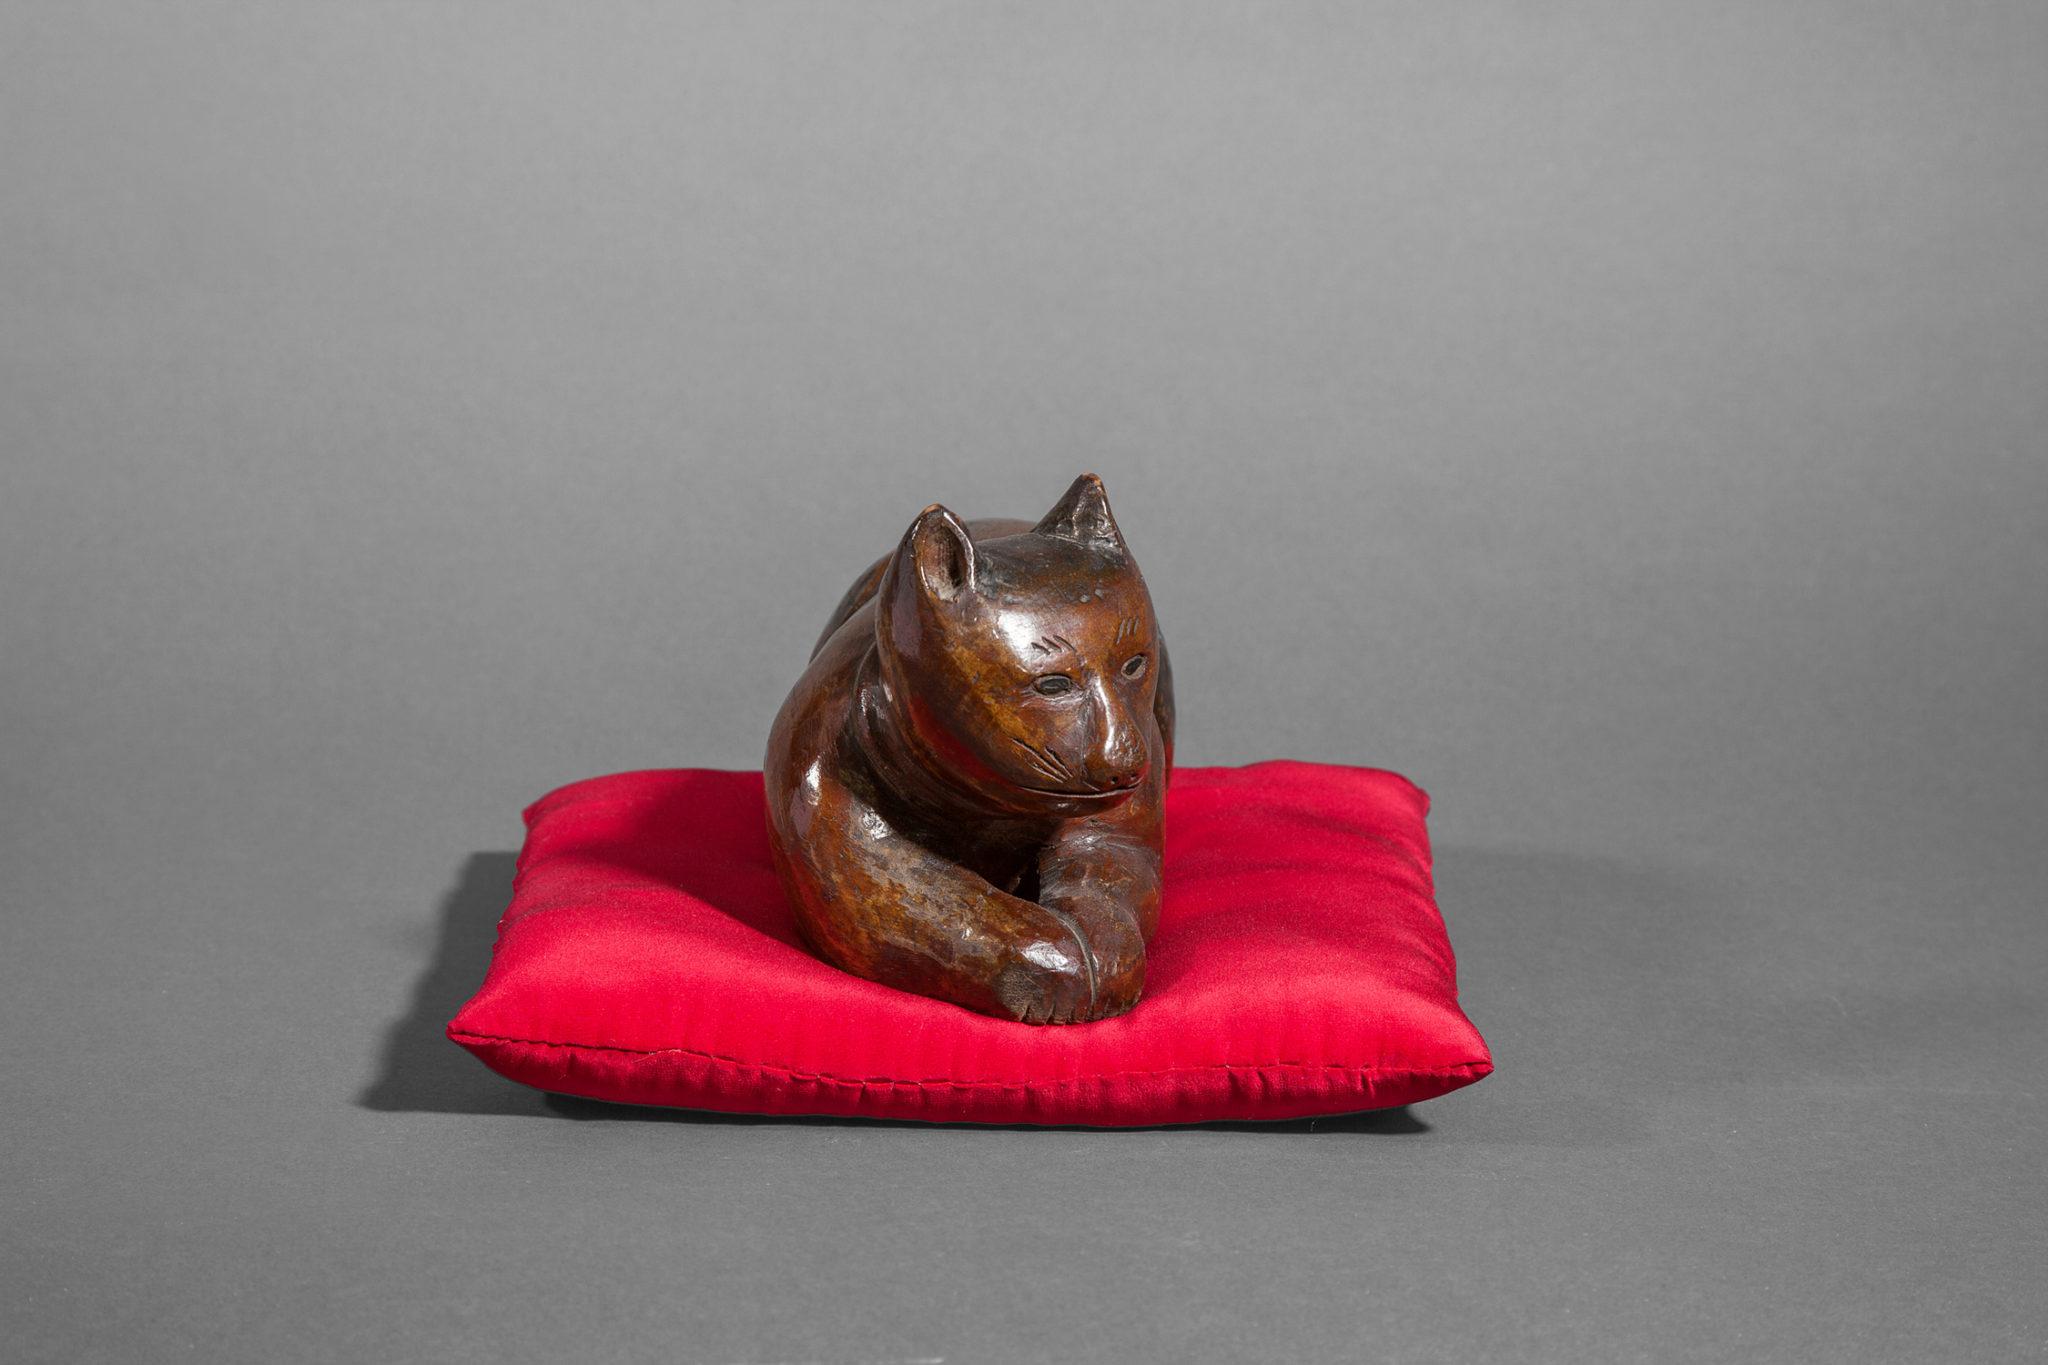 mingei, japanese antique, japanese sculpture